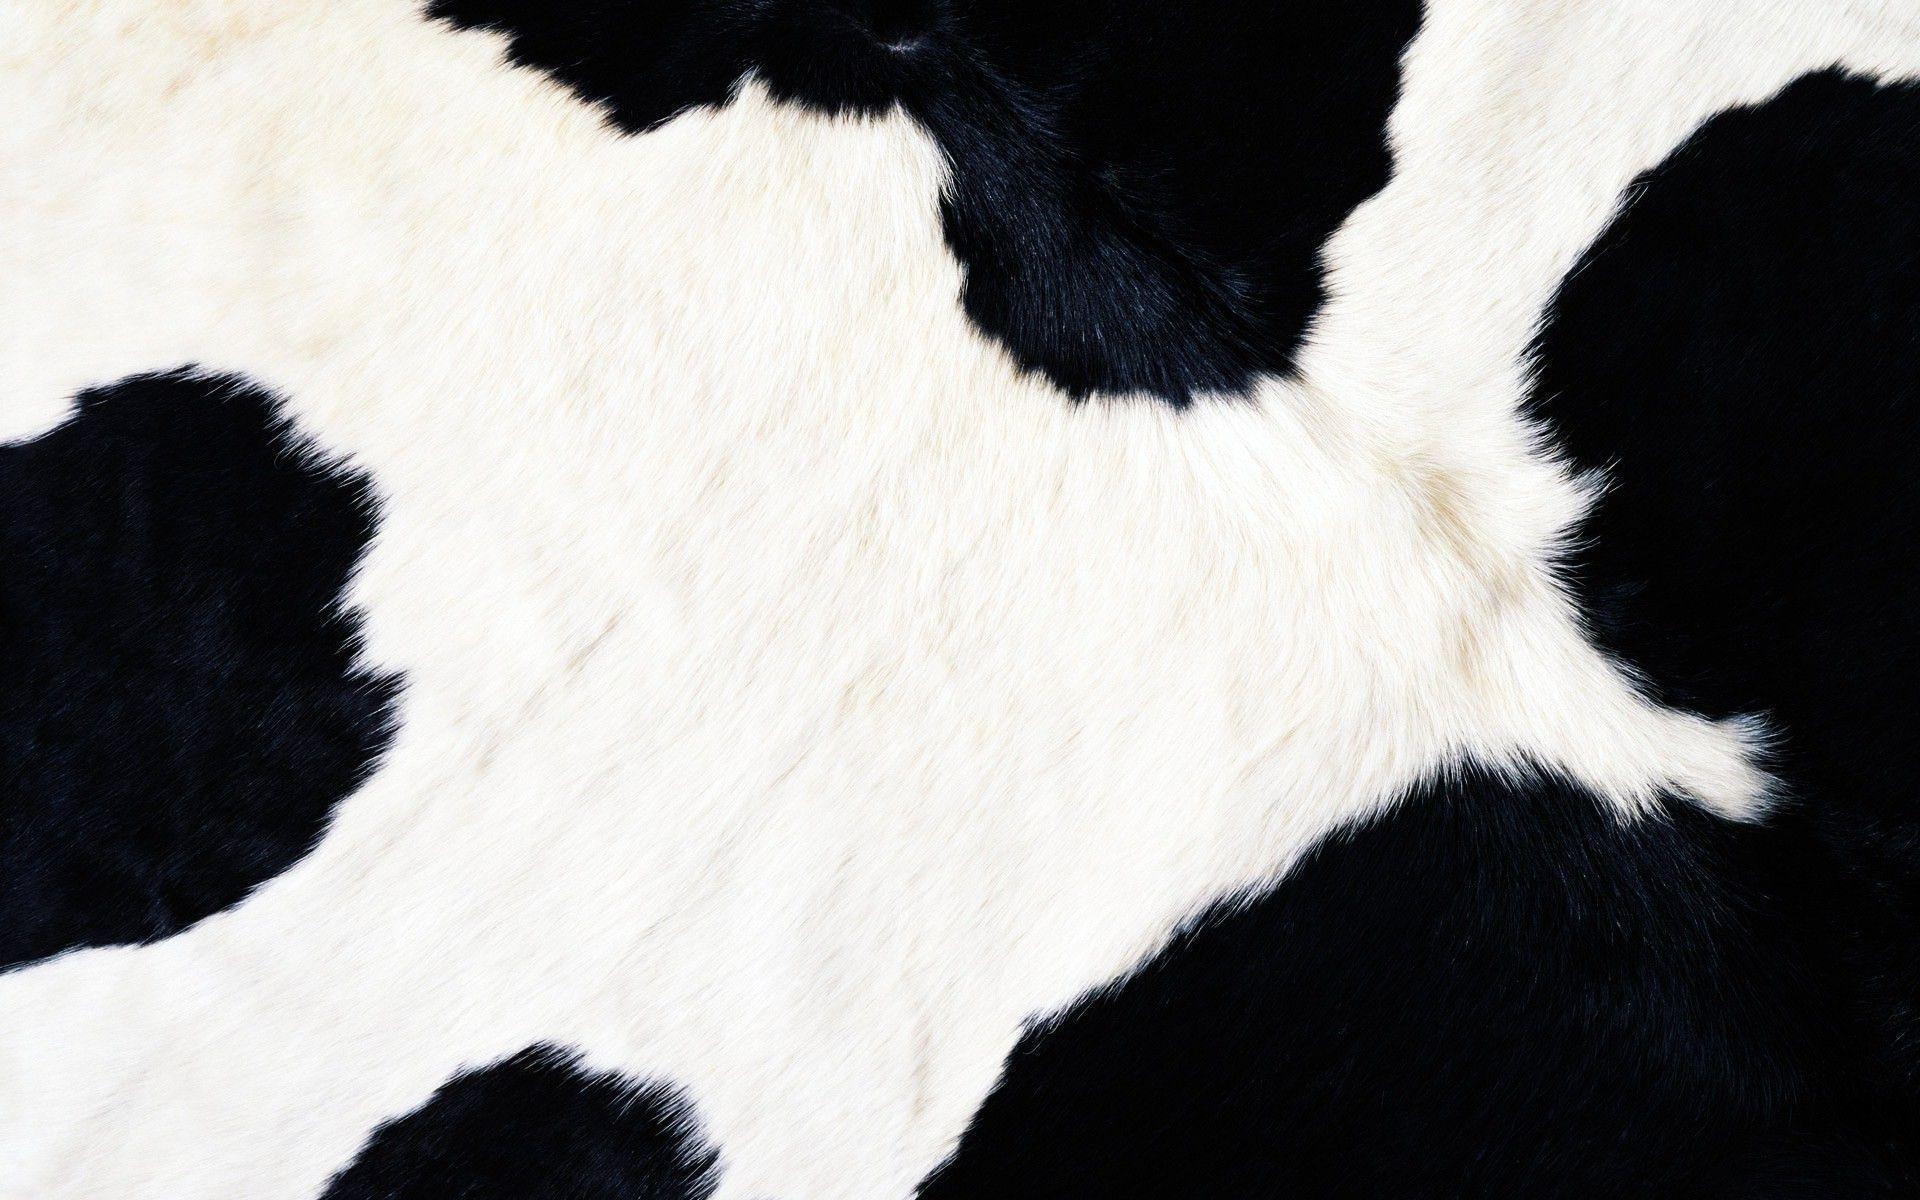 cattle photographs